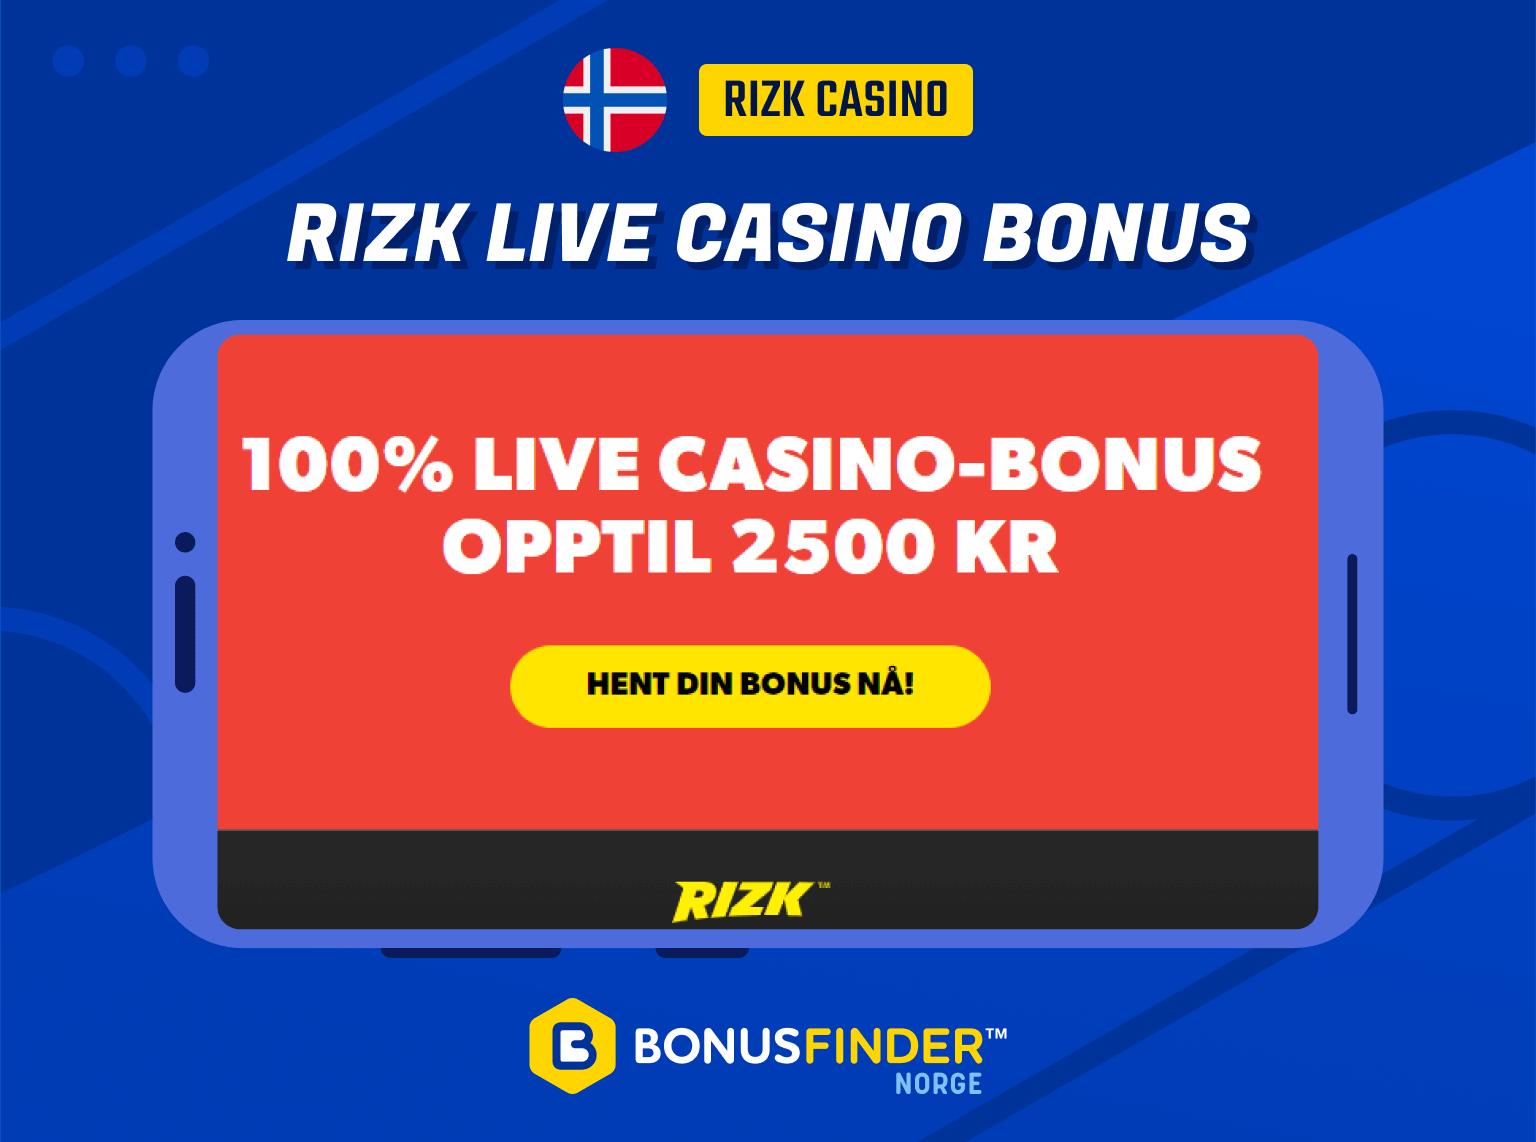 rizk casino live bonus